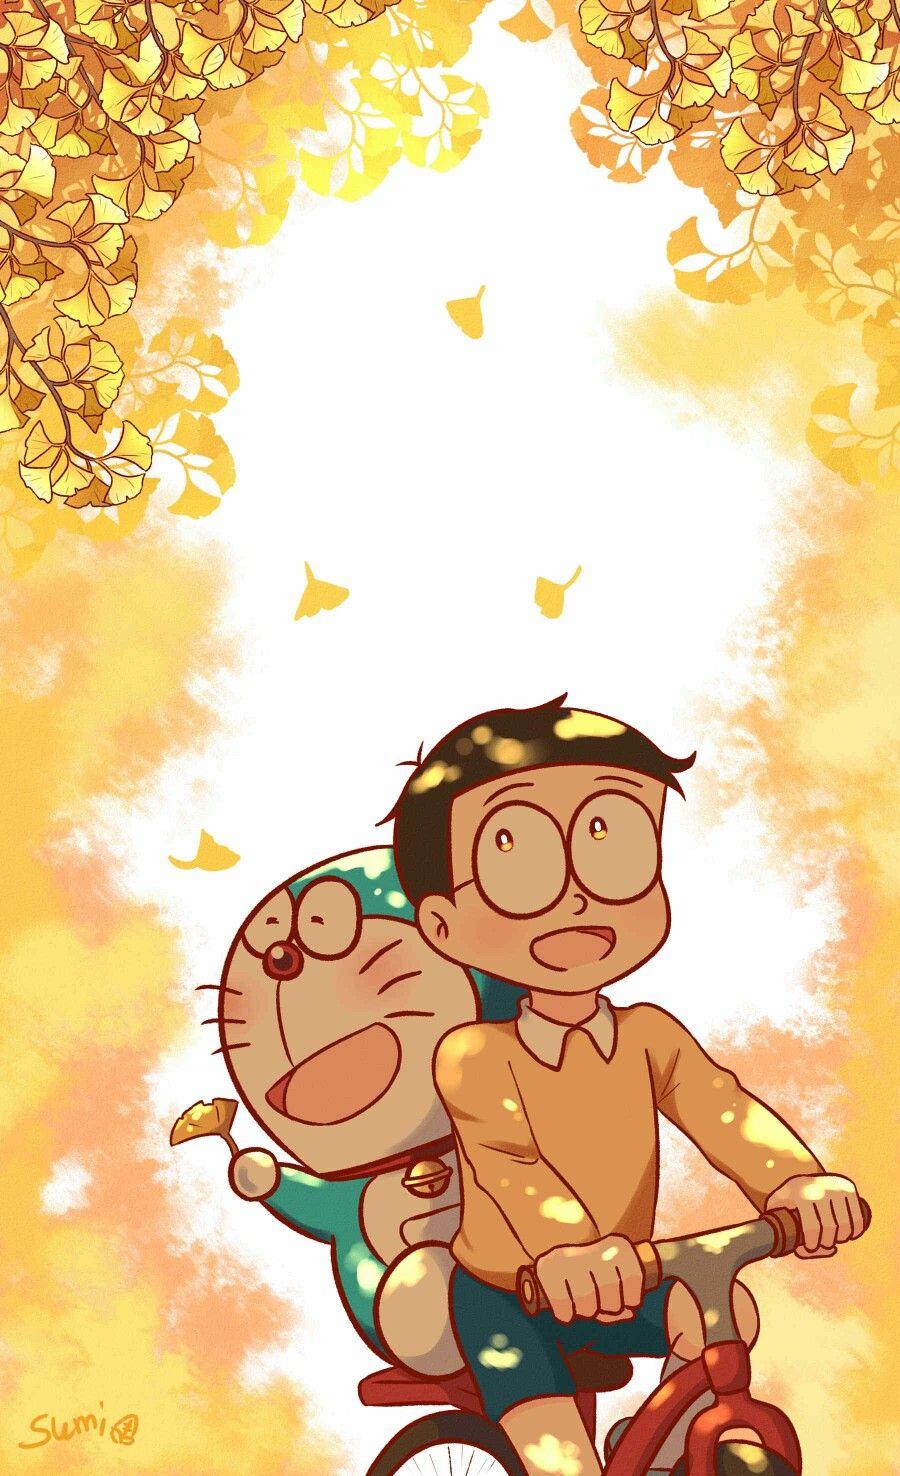 Pin by Auttu Magar on Đoraemon Doremon cartoon, Doraemon